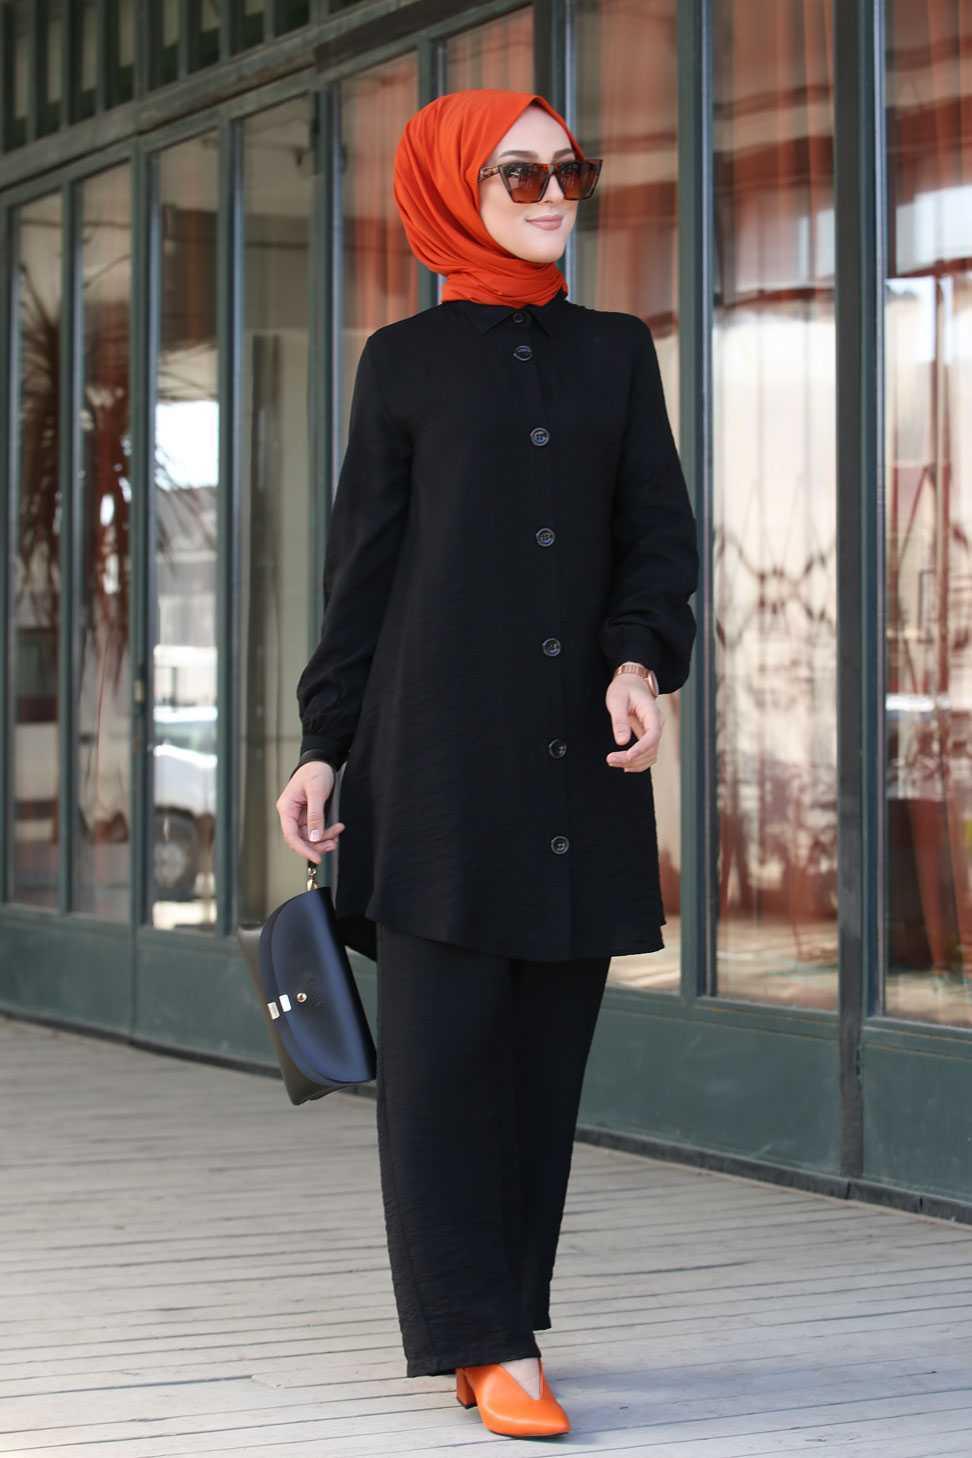 Tofisa Tesettür Ayrobin Gömlek Modelleri